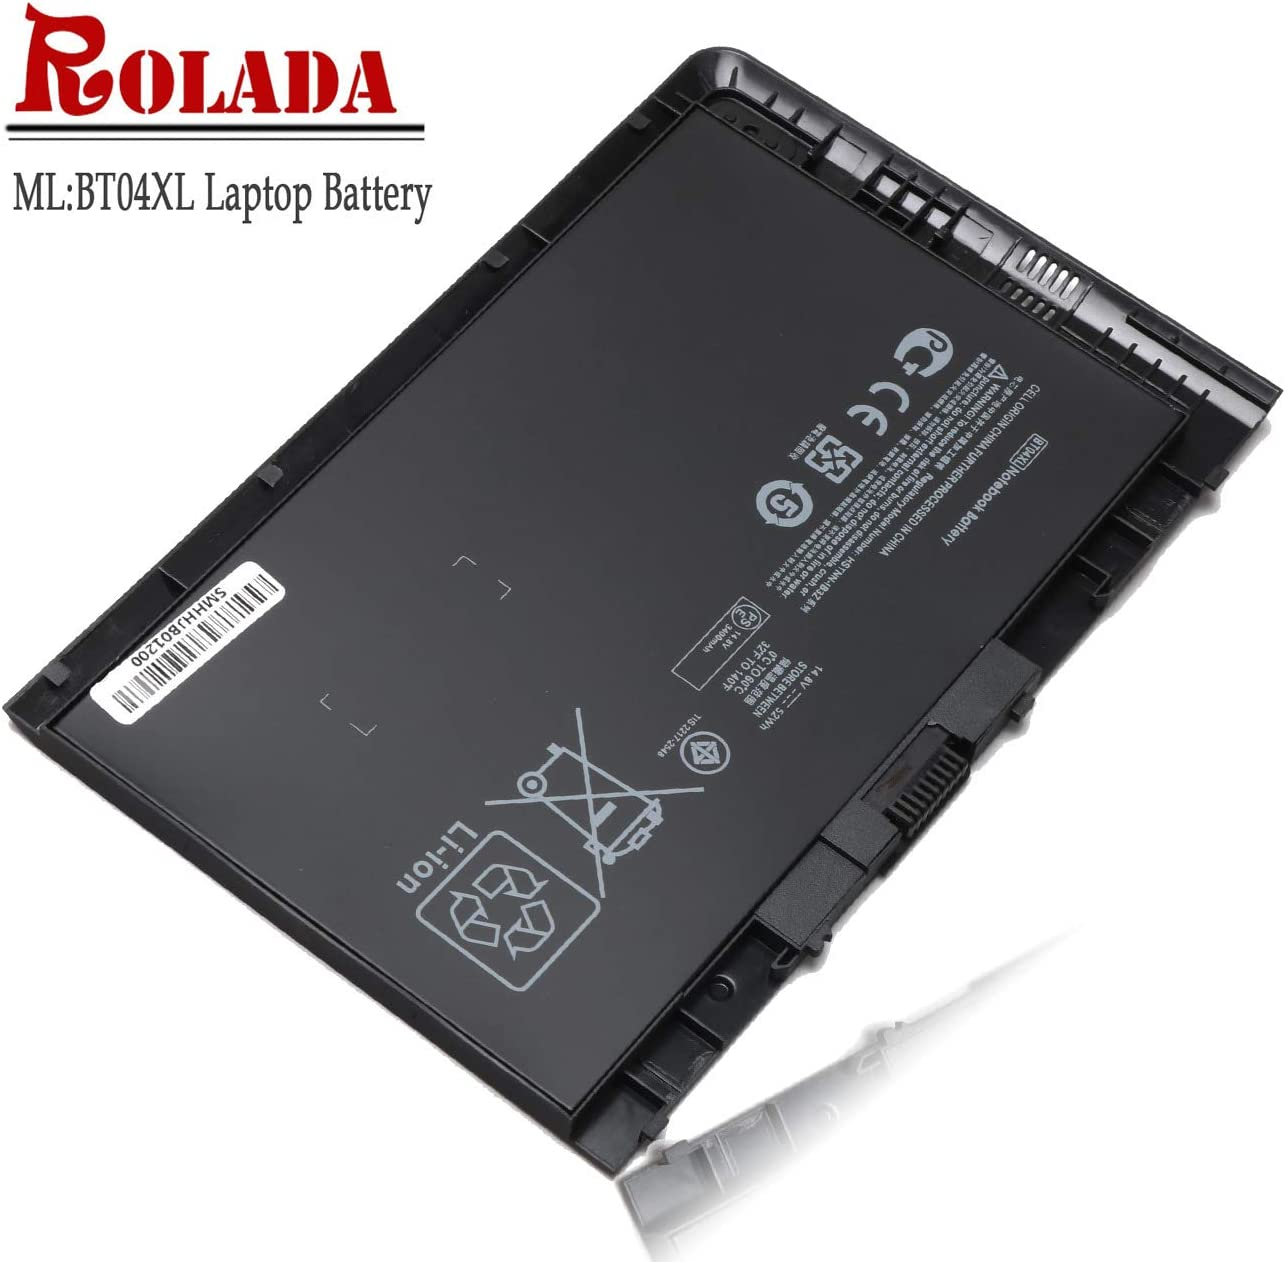 BT04 BT04XL Battery Replacement for HP EliteBook Folio 9470 9470M Series HSTNN-IB3Z HSTNN-I10C HSTNN-DB3Z H4Q47AA H4Q48AA BT04 BA06 Spare 687945-001 696621-001 687517-1C1 14.8V 52Wh